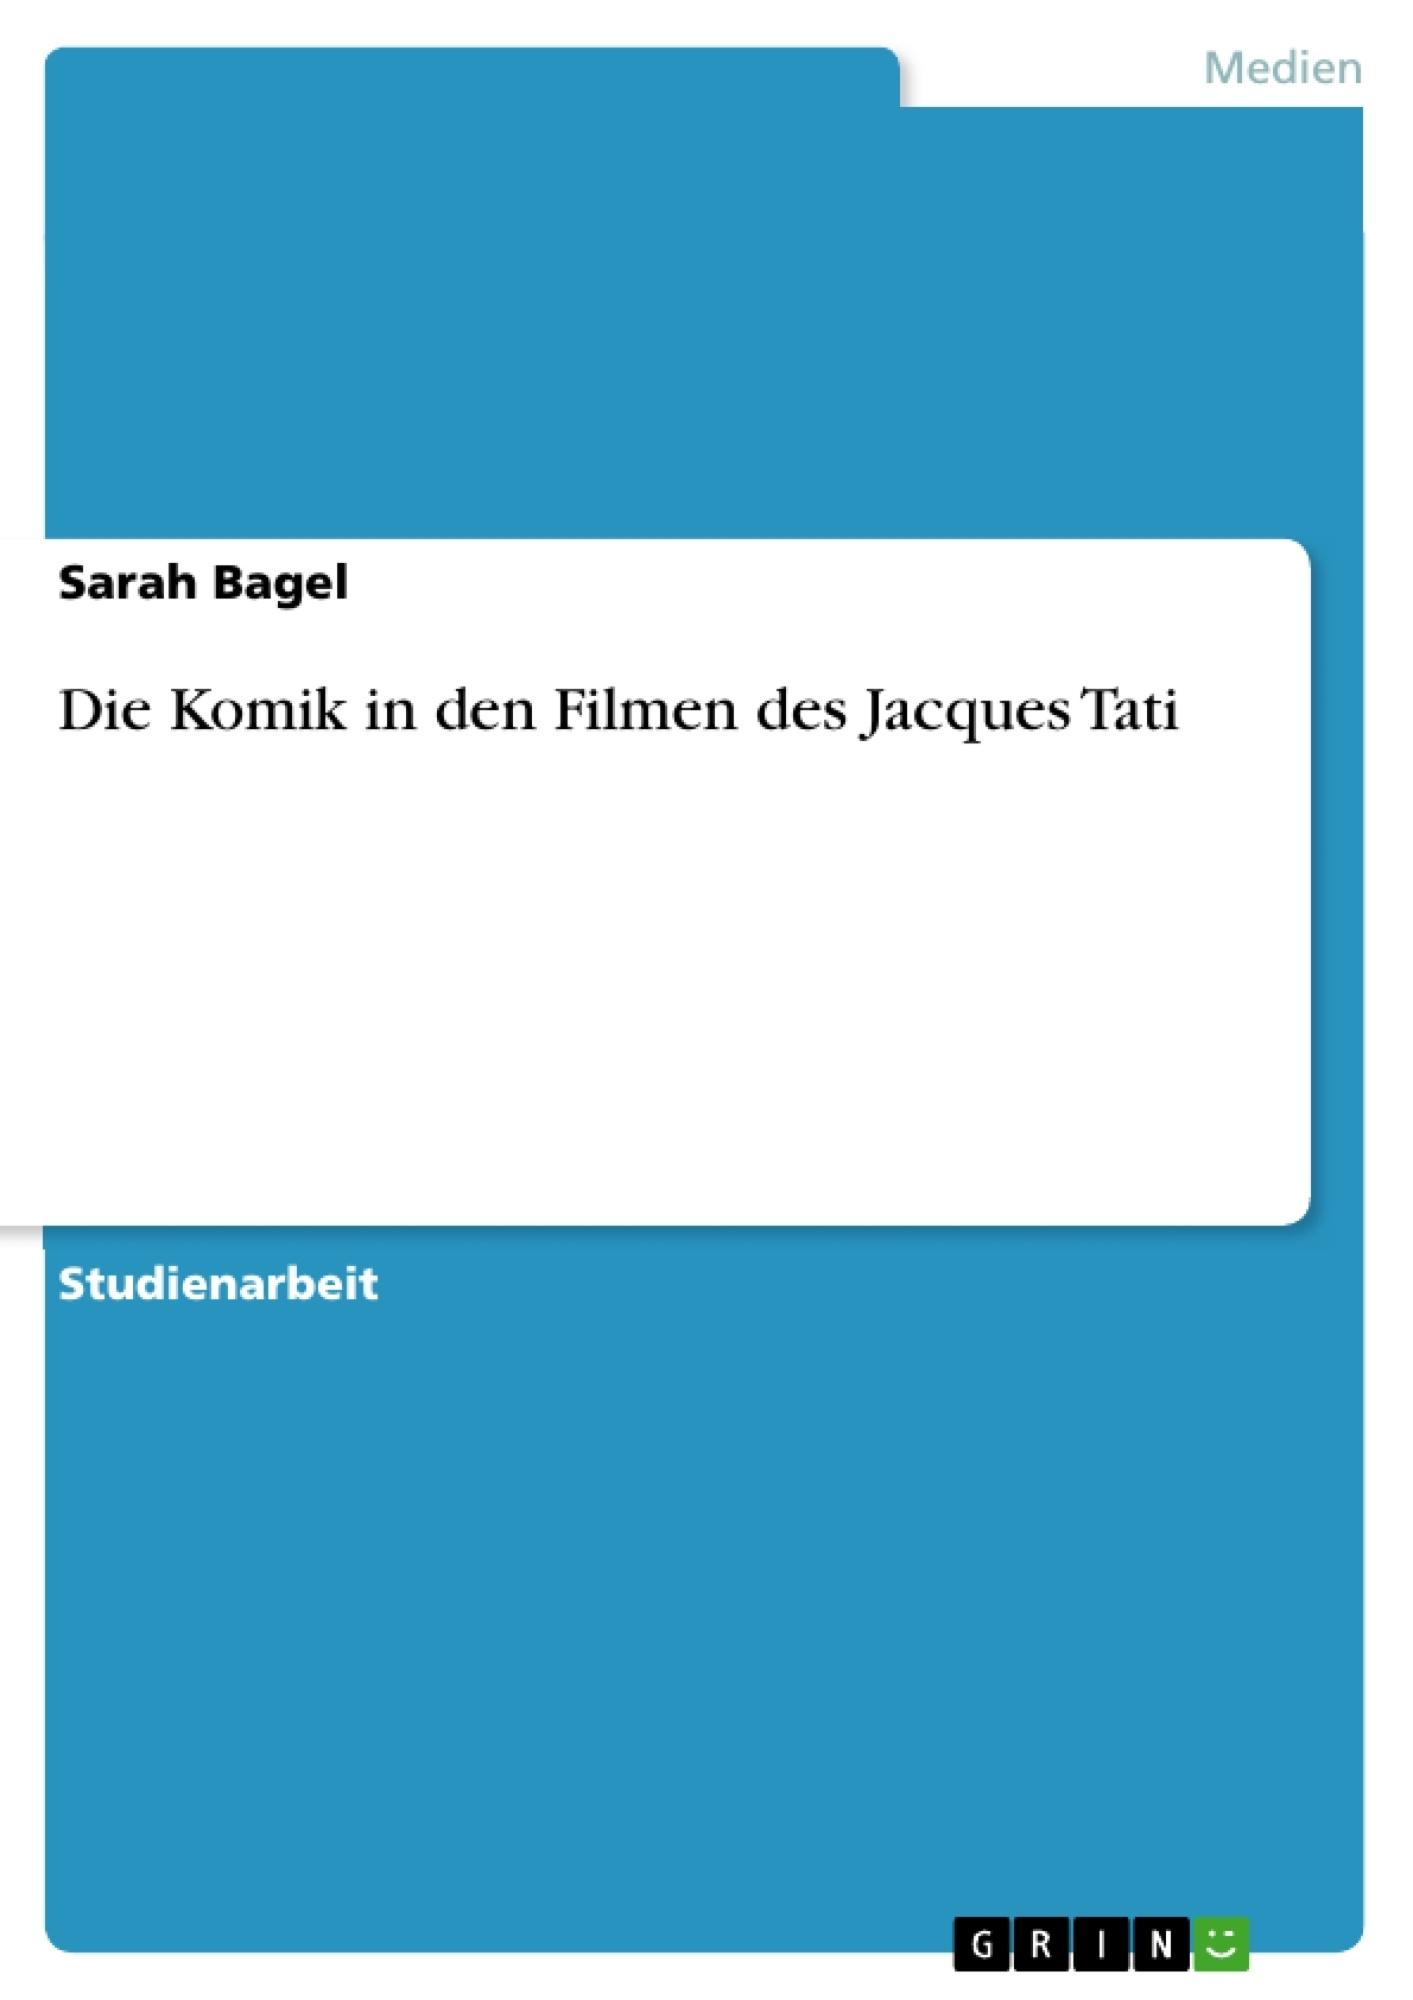 Titel: Die Komik in den Filmen des Jacques Tati